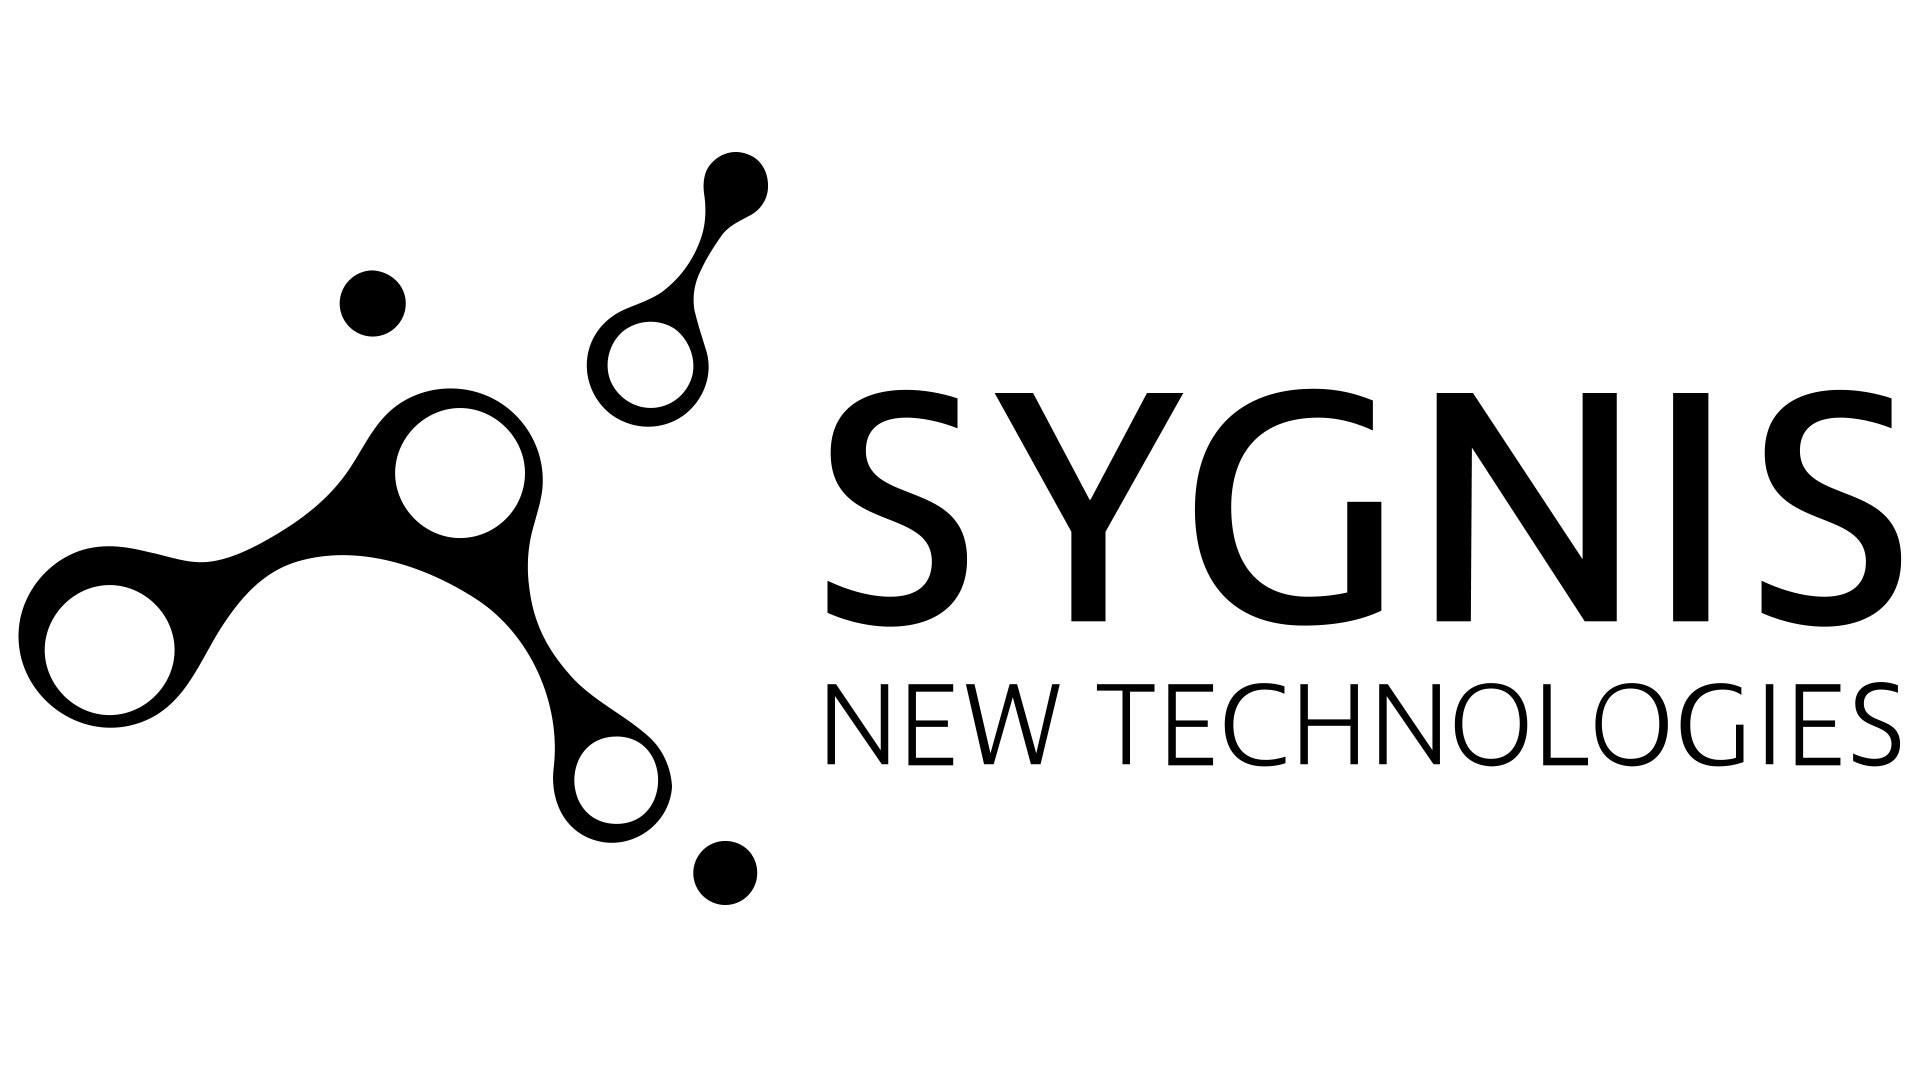 Początek prac nad prototypem hybrydowej drukarki 3D SYGPAST